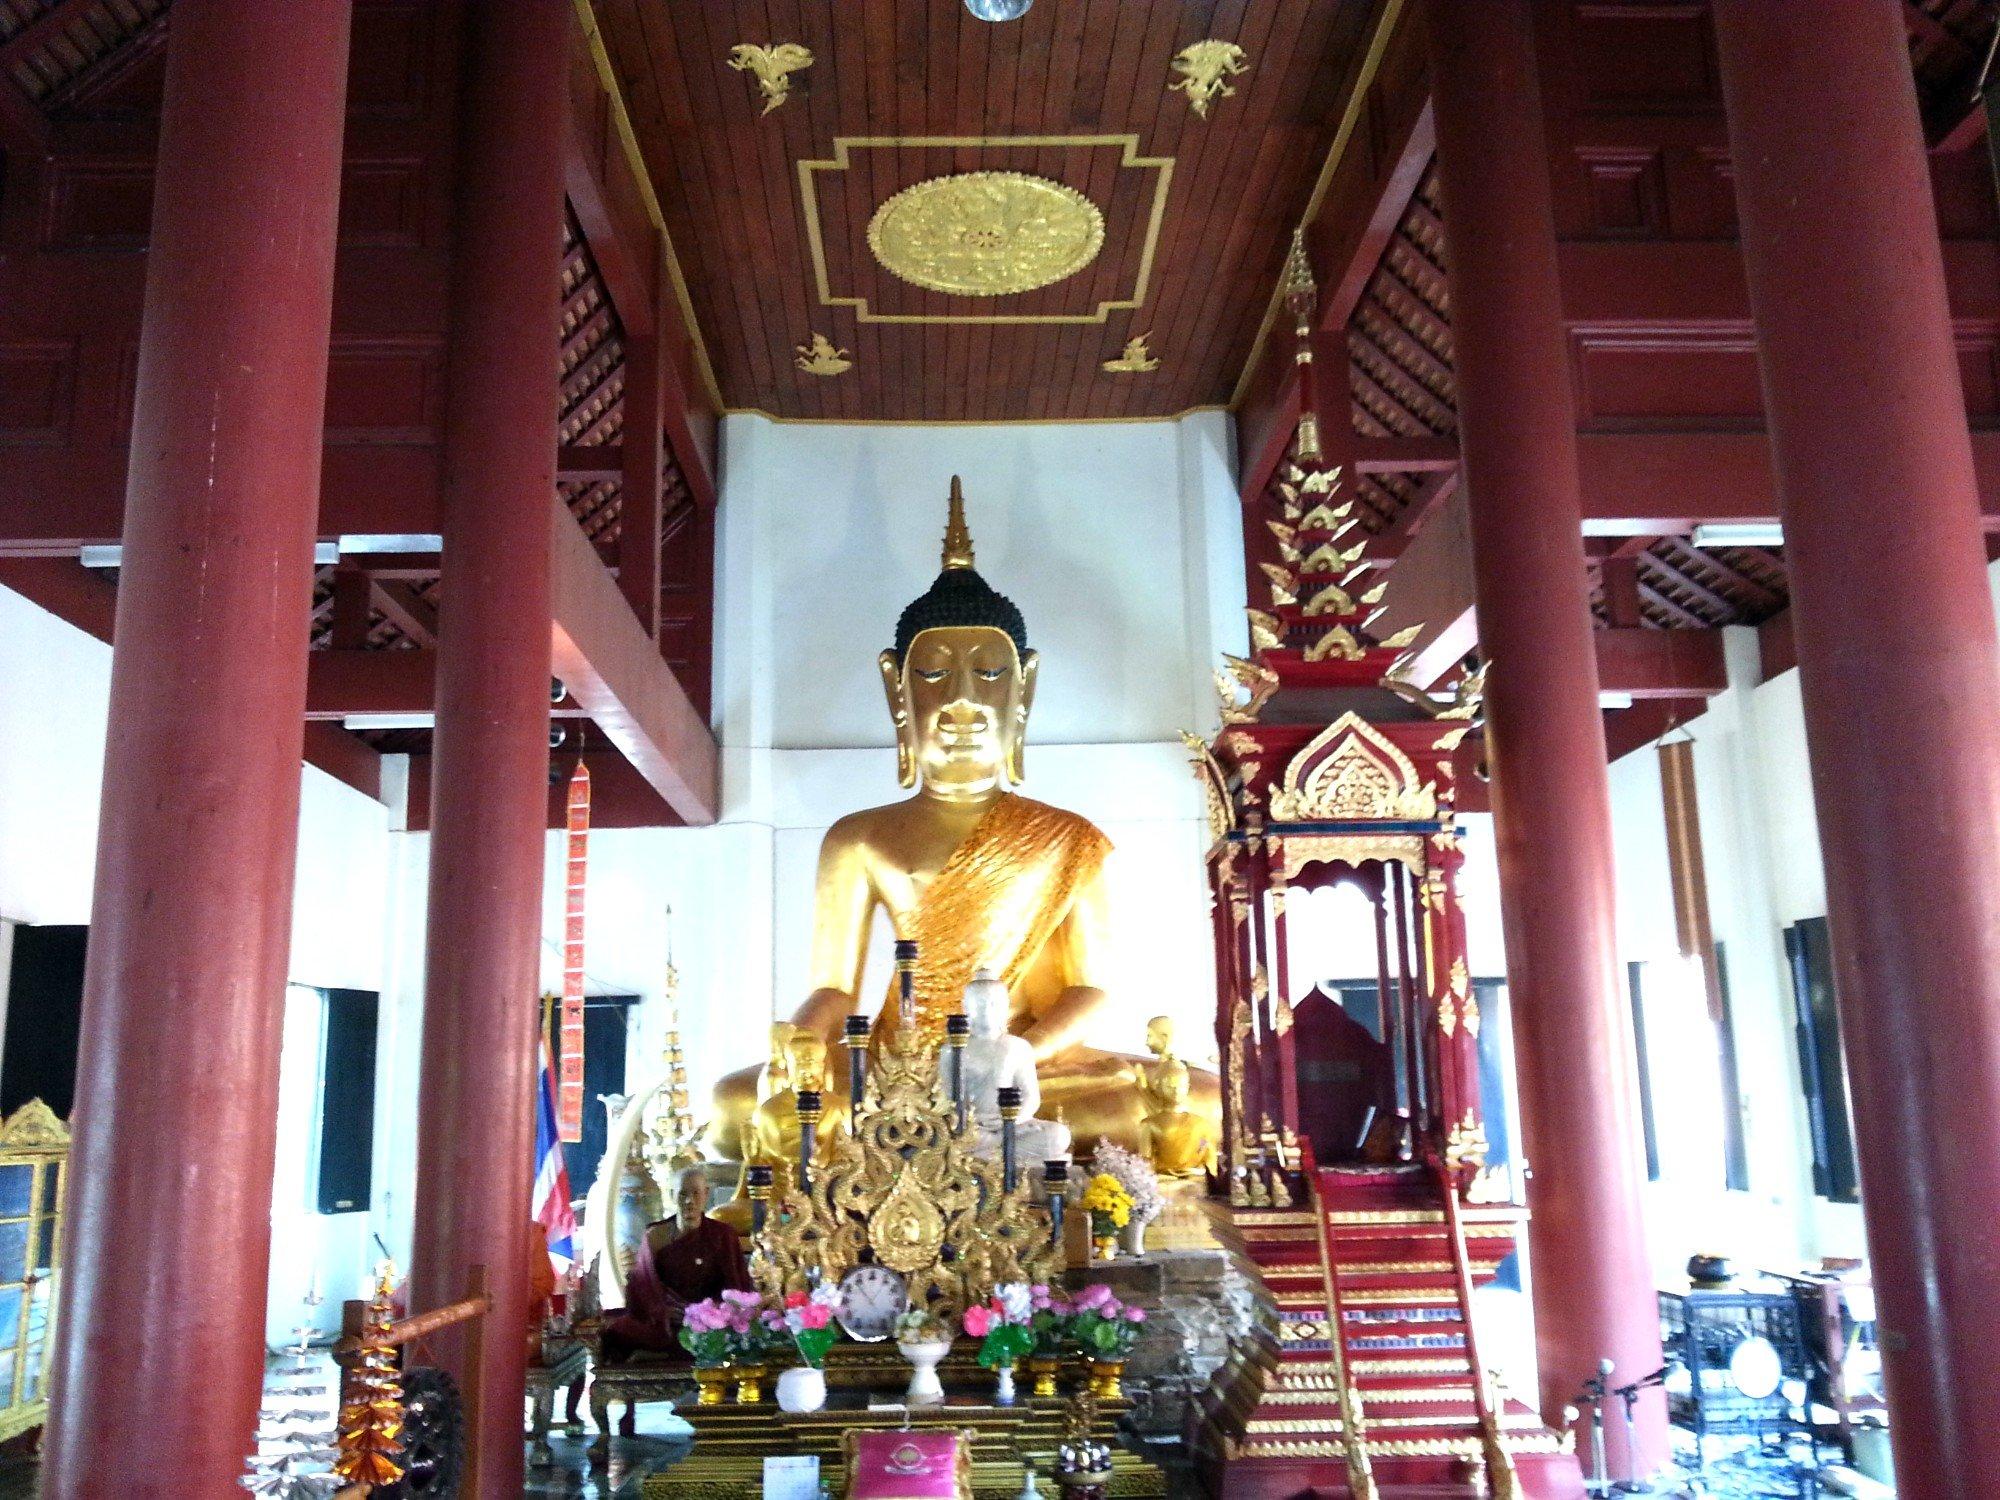 Inside the prayer hall at Wat Jet Lin